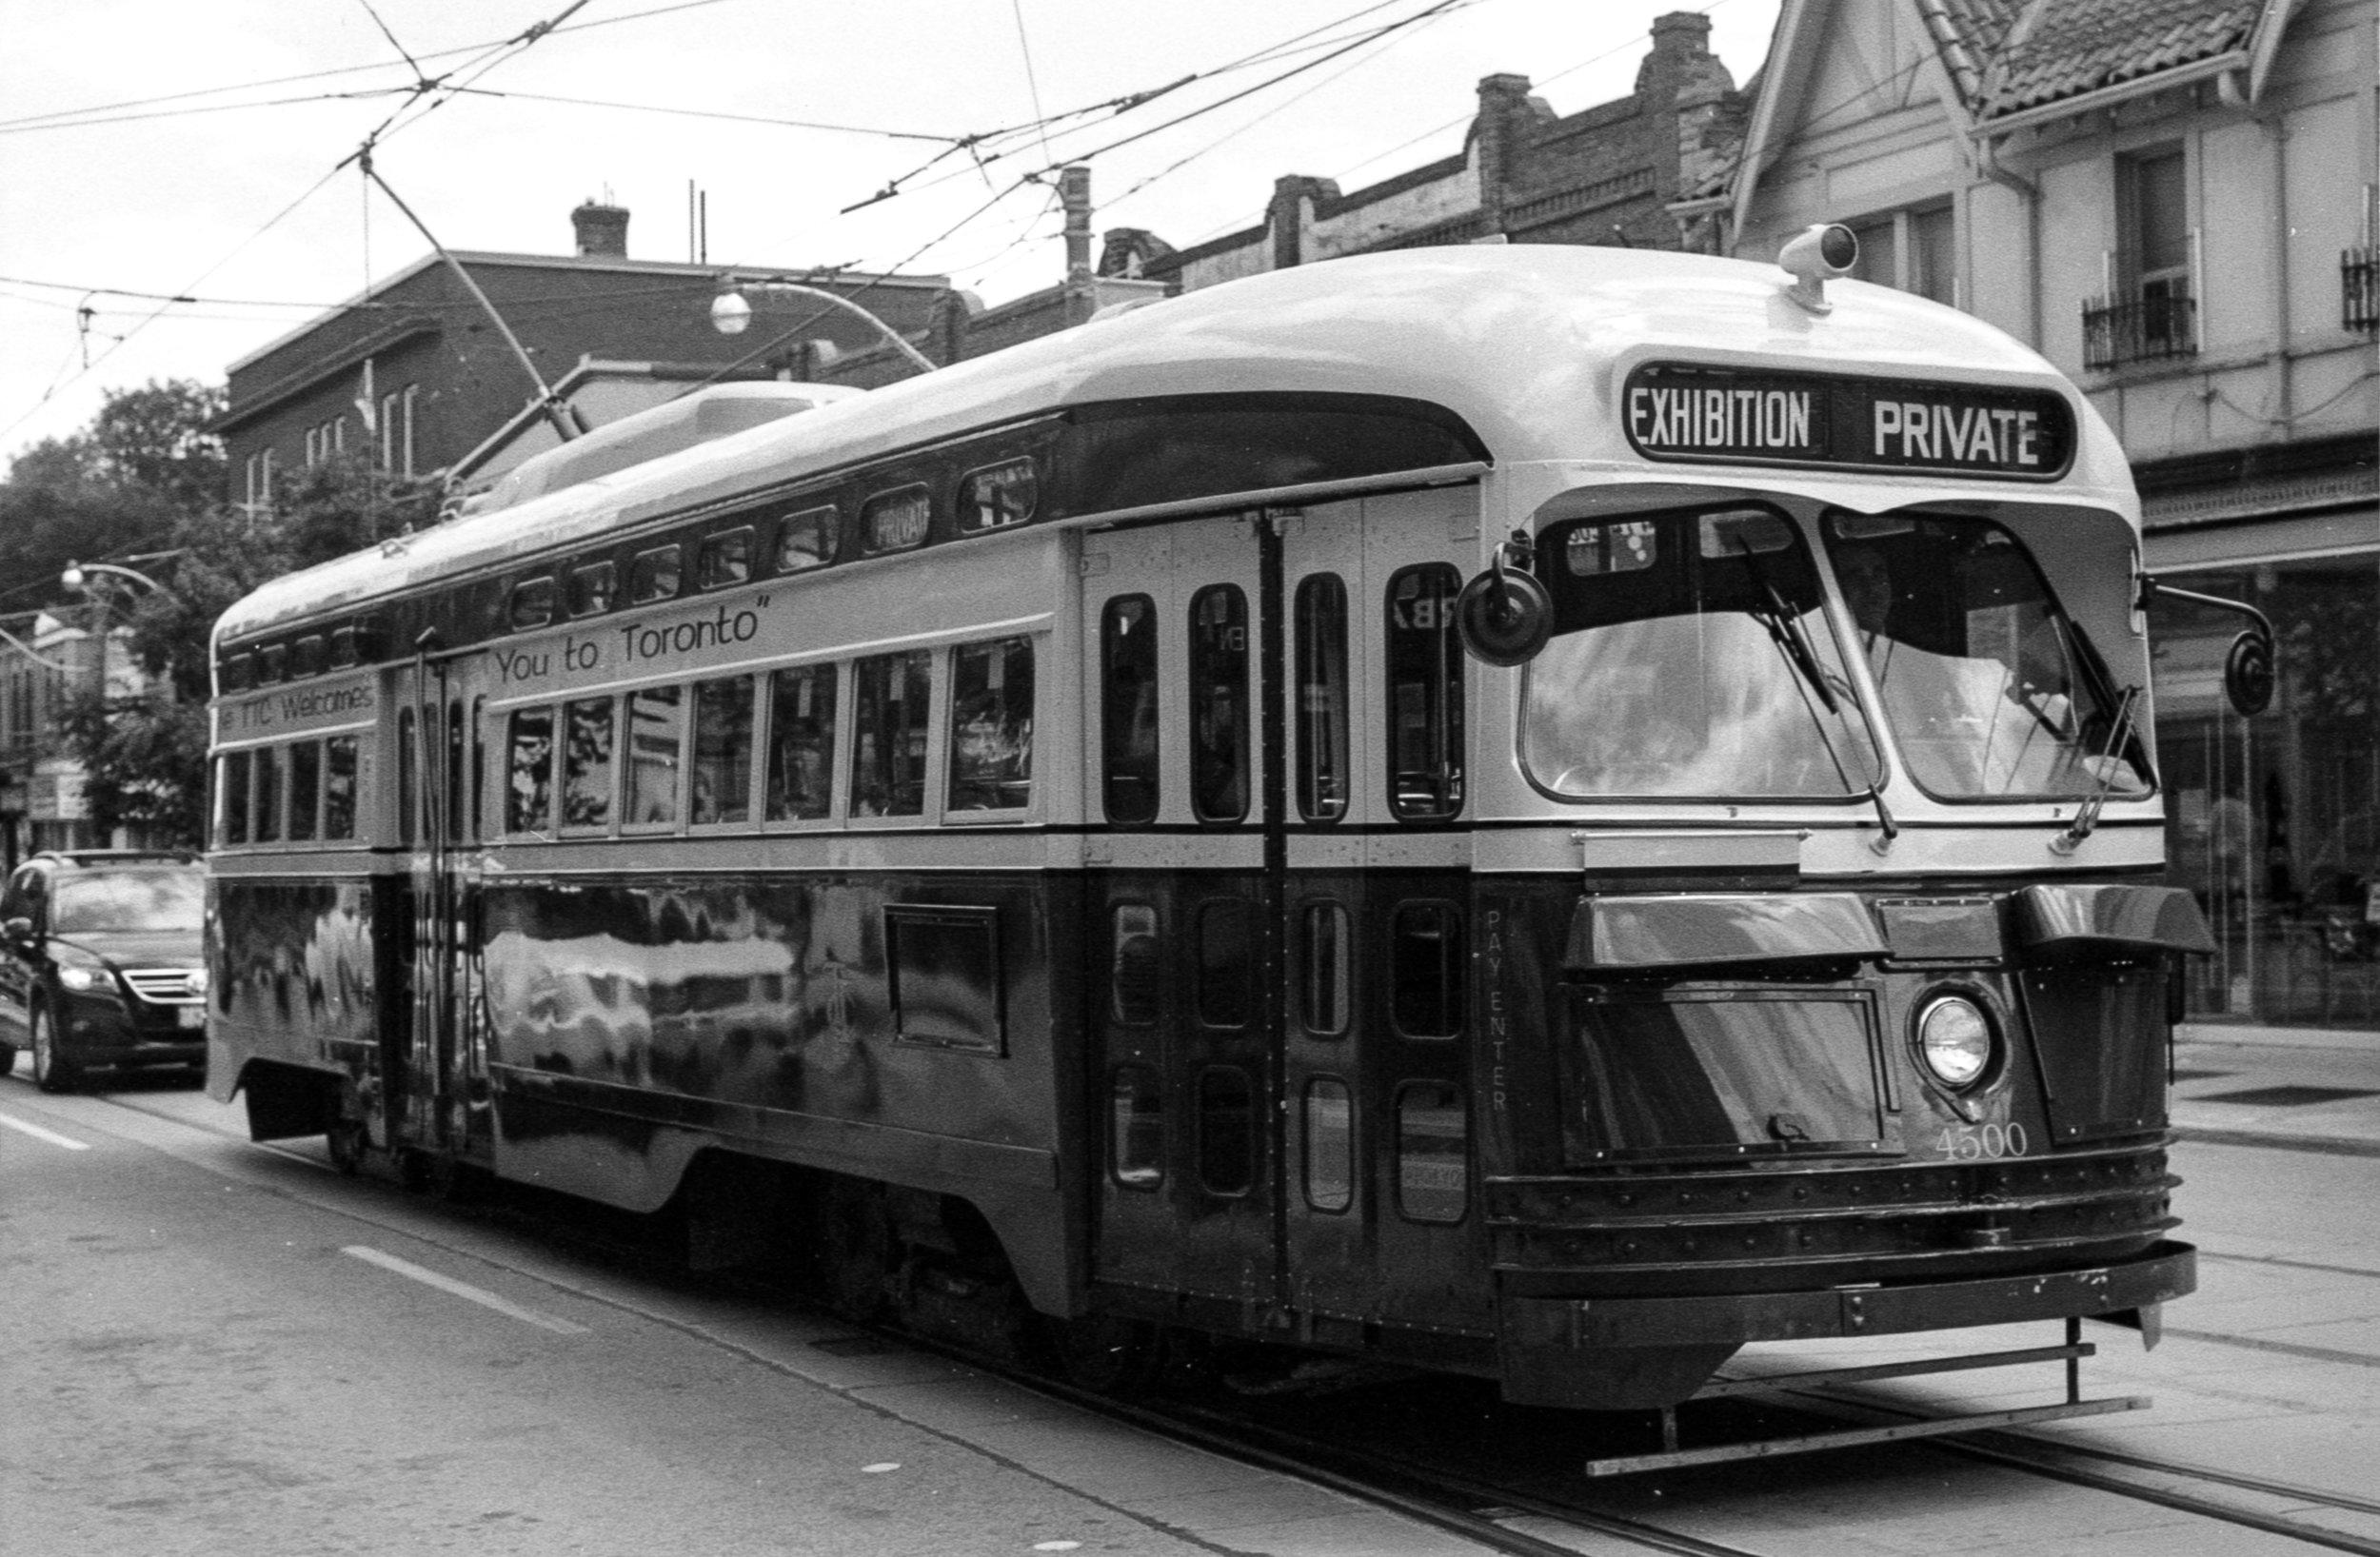 PCC Car on Queen St. East.jpg